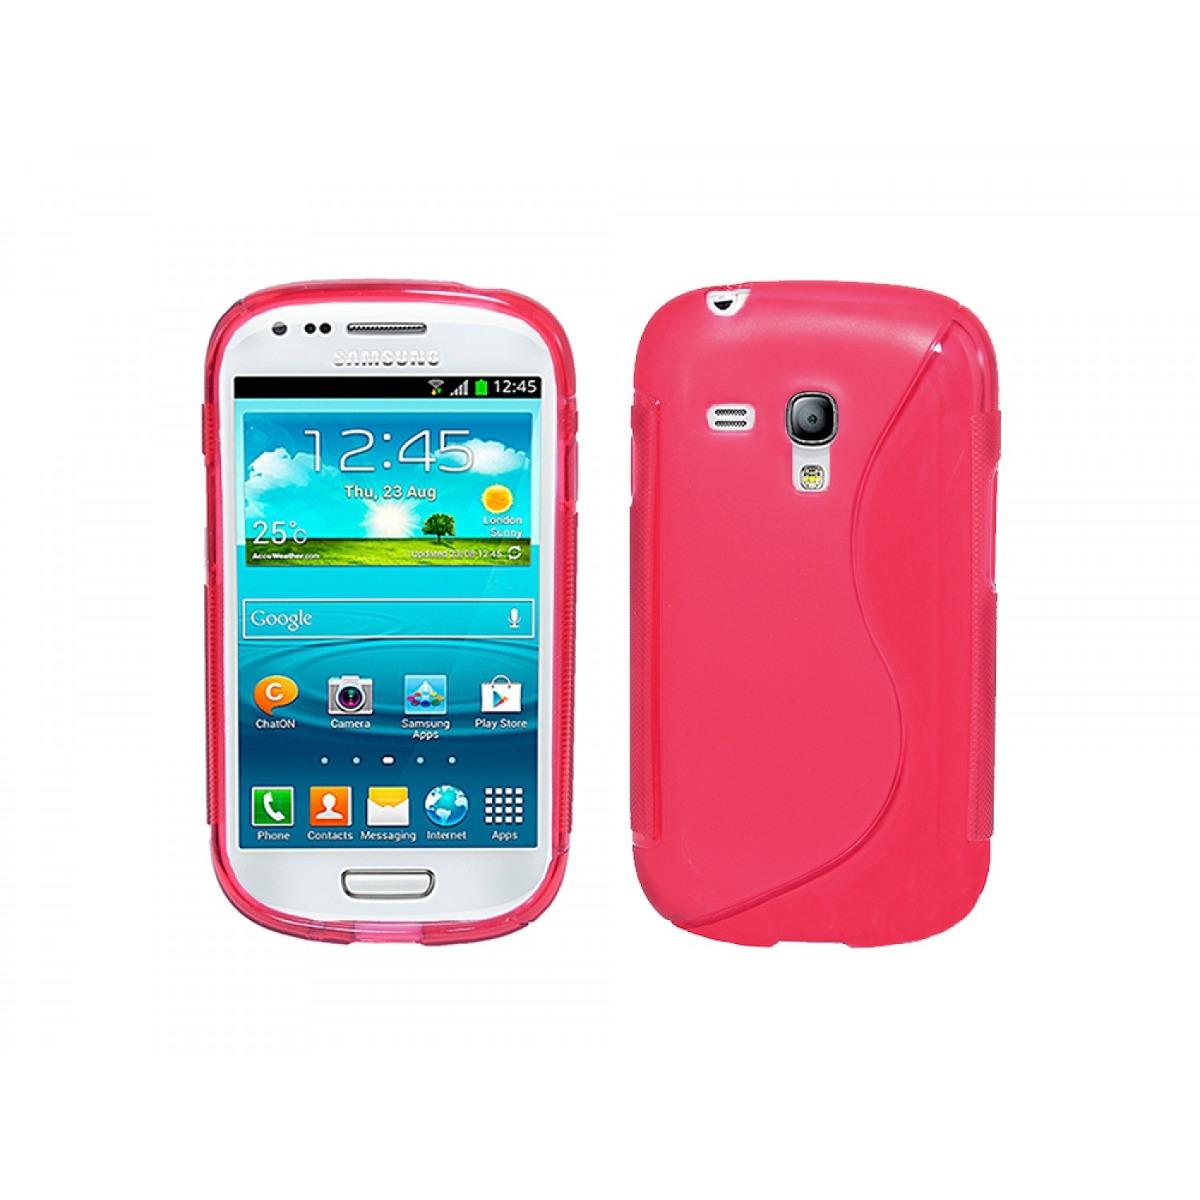 1fbc78f1bd7 Forro Protector Para Samsung Galaxy S3 Mini I8190 - Bs. 0,19 en Mercado  Libre